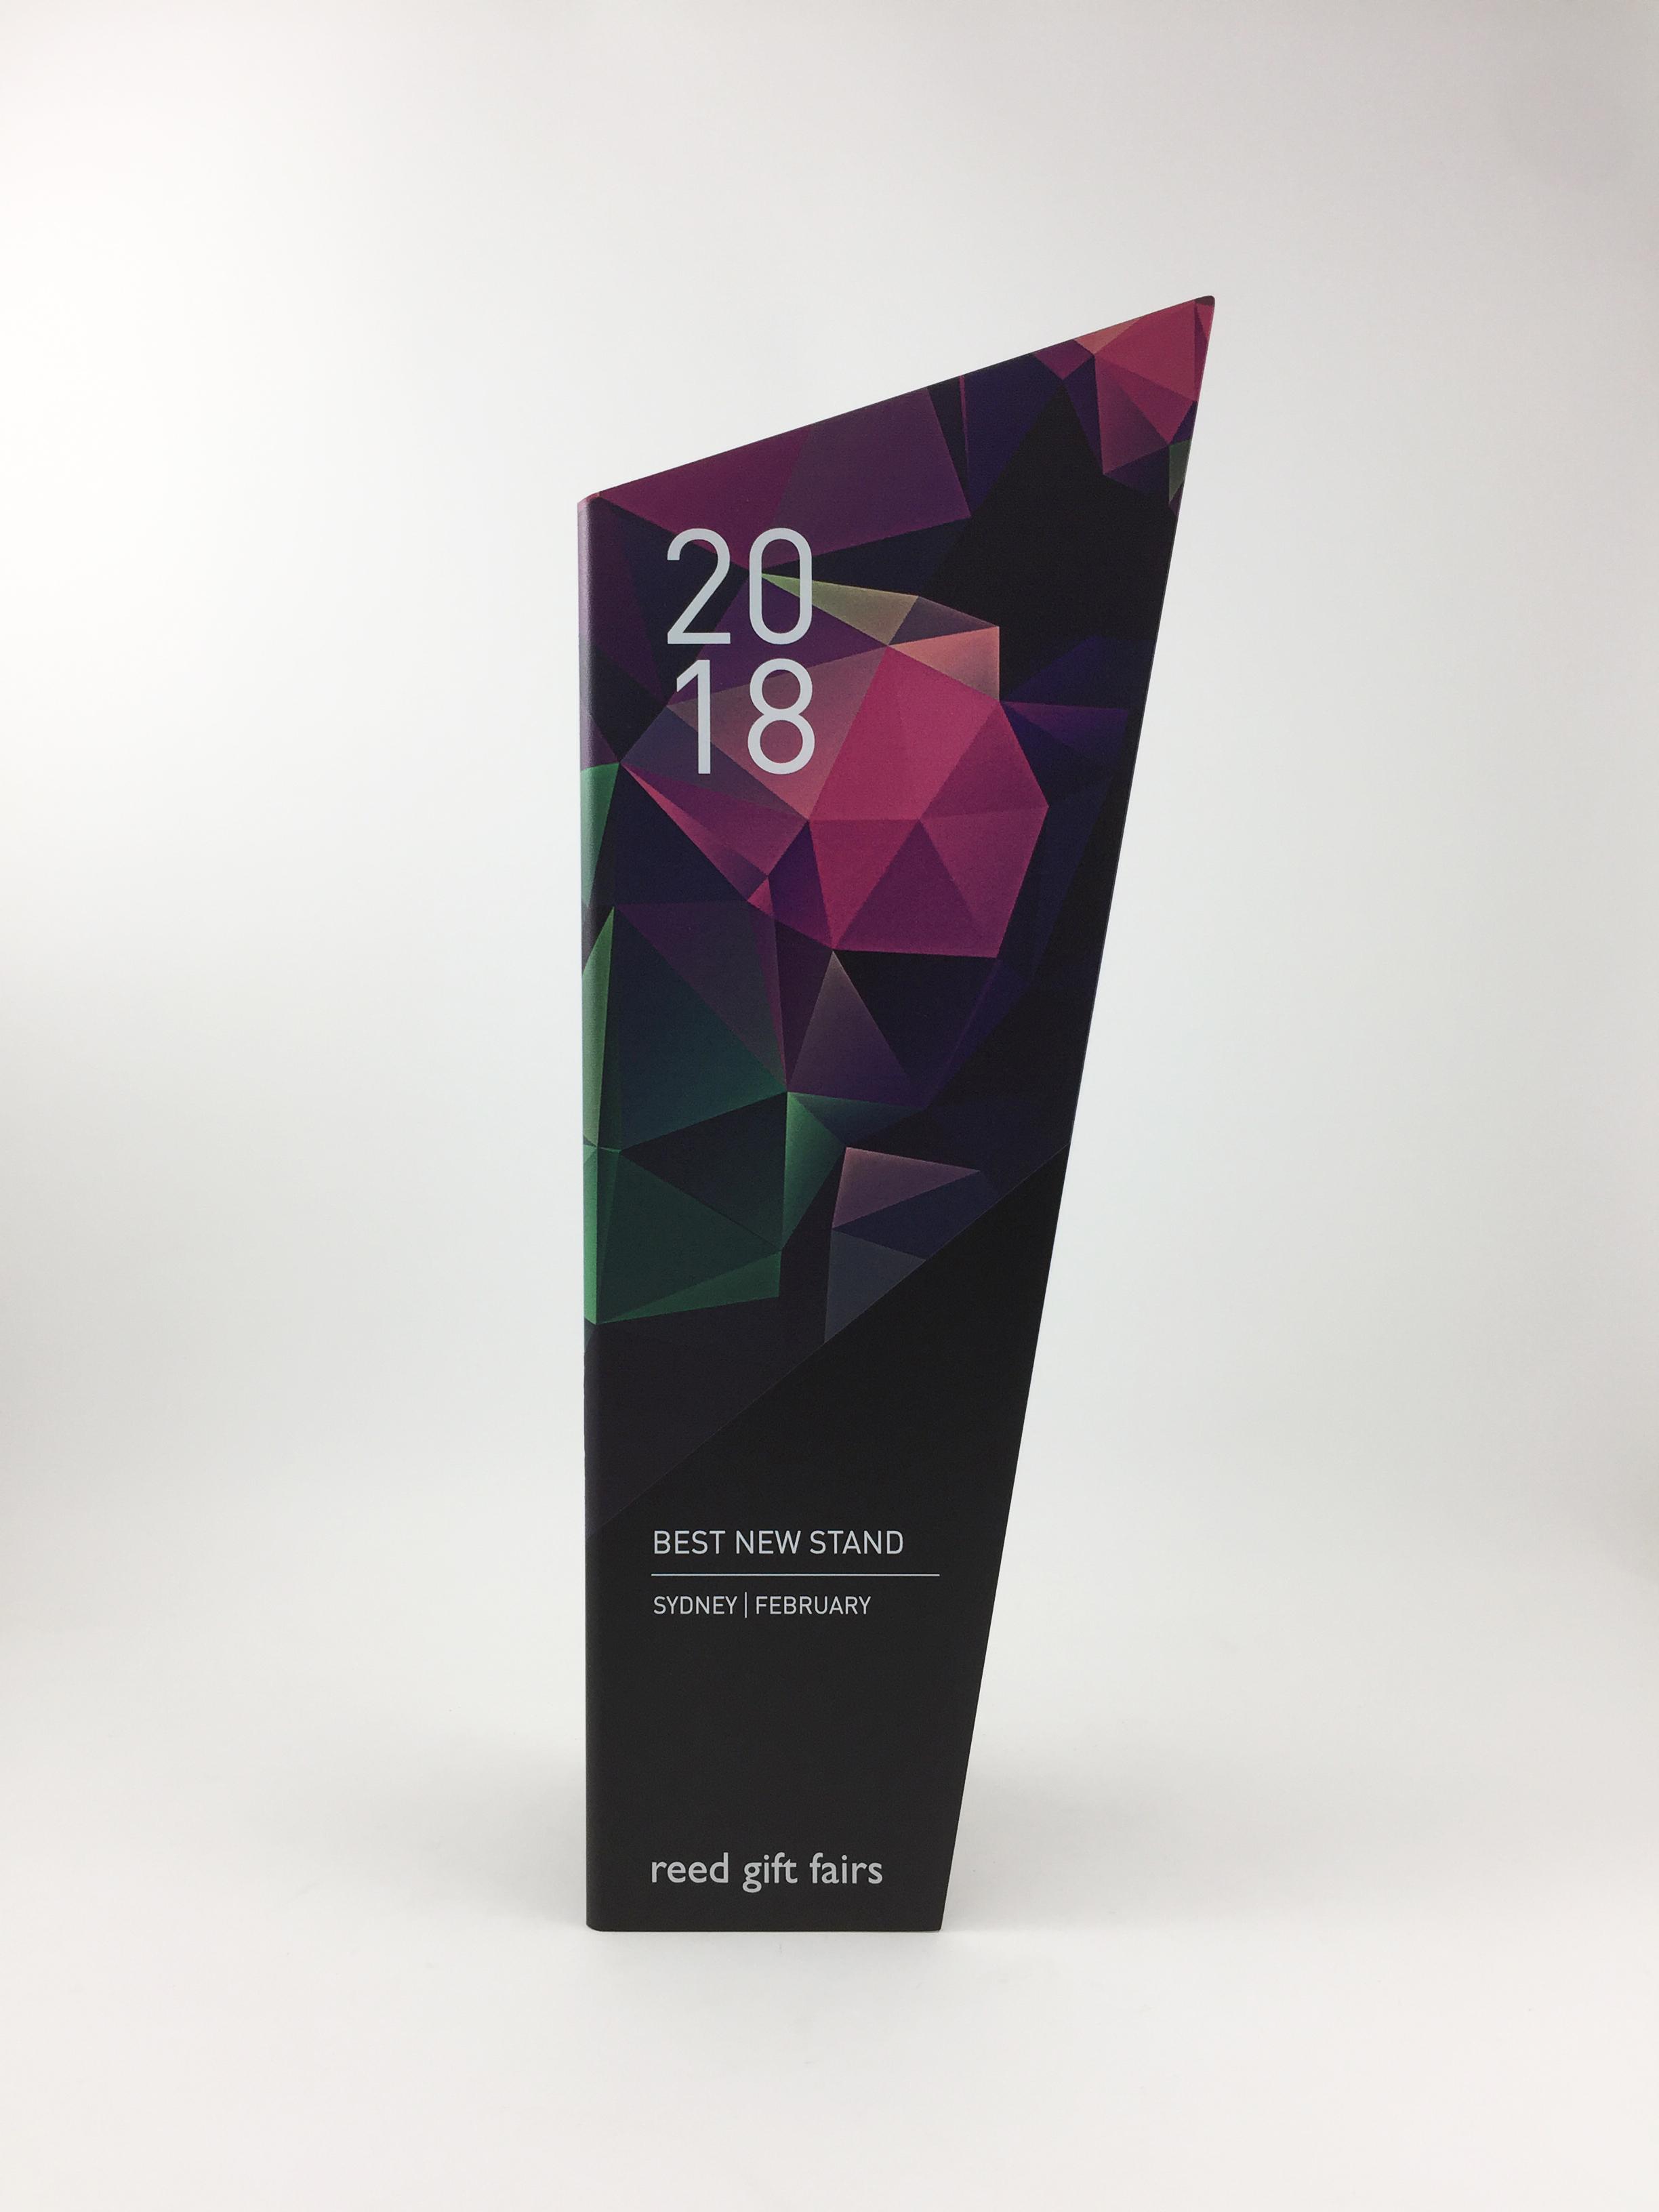 reed-gift-fairs-graphic-print-aluminium-trophy-award-02.jpg